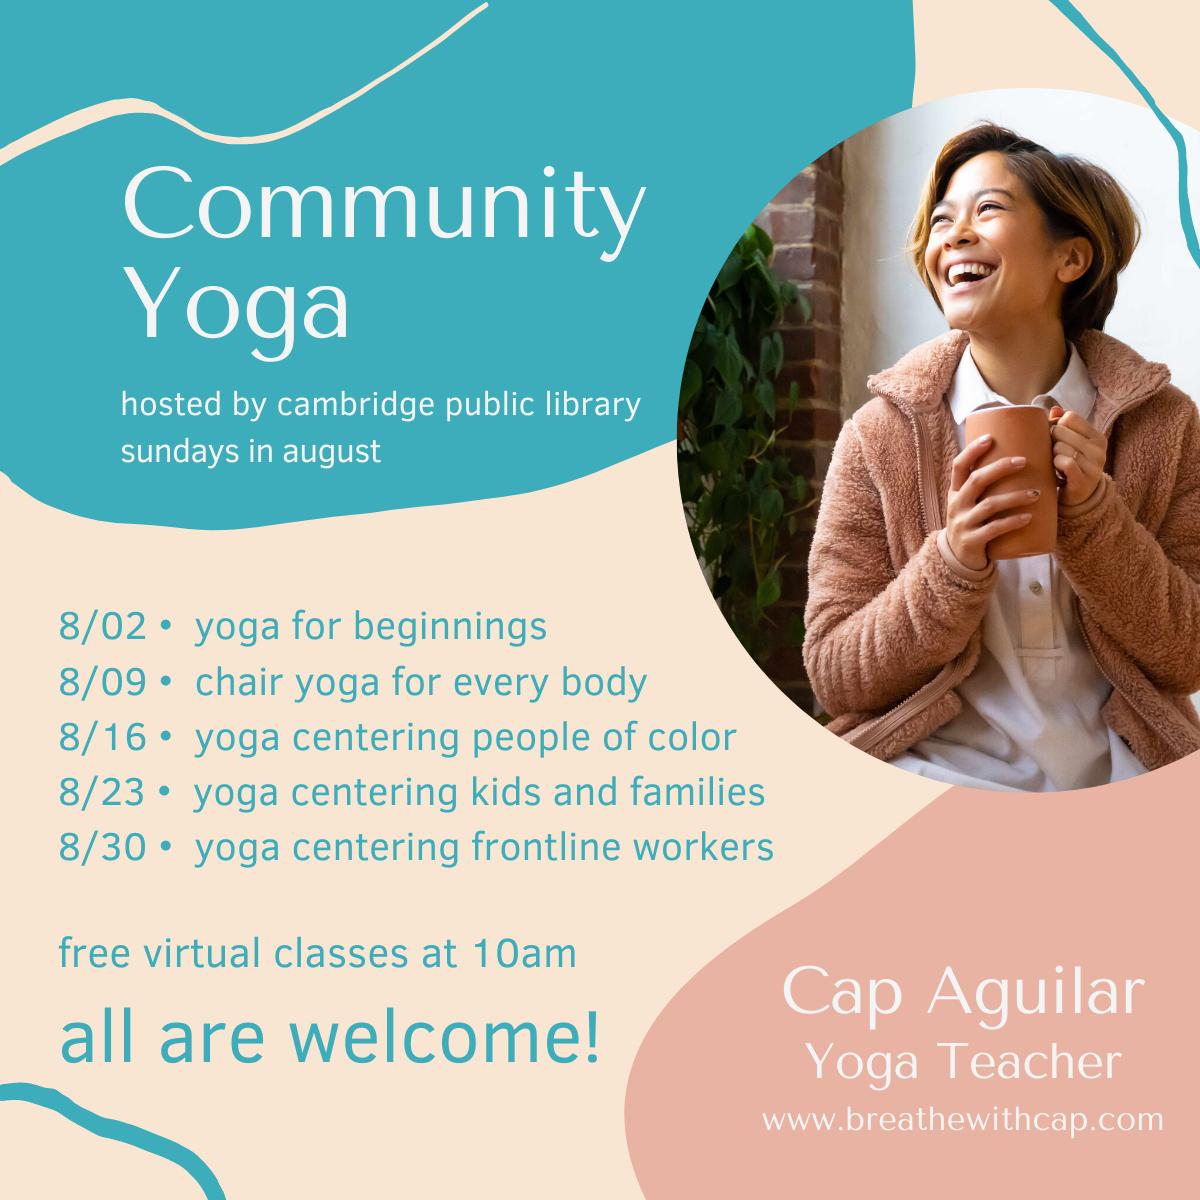 Community Yoga with Cap Aguilar